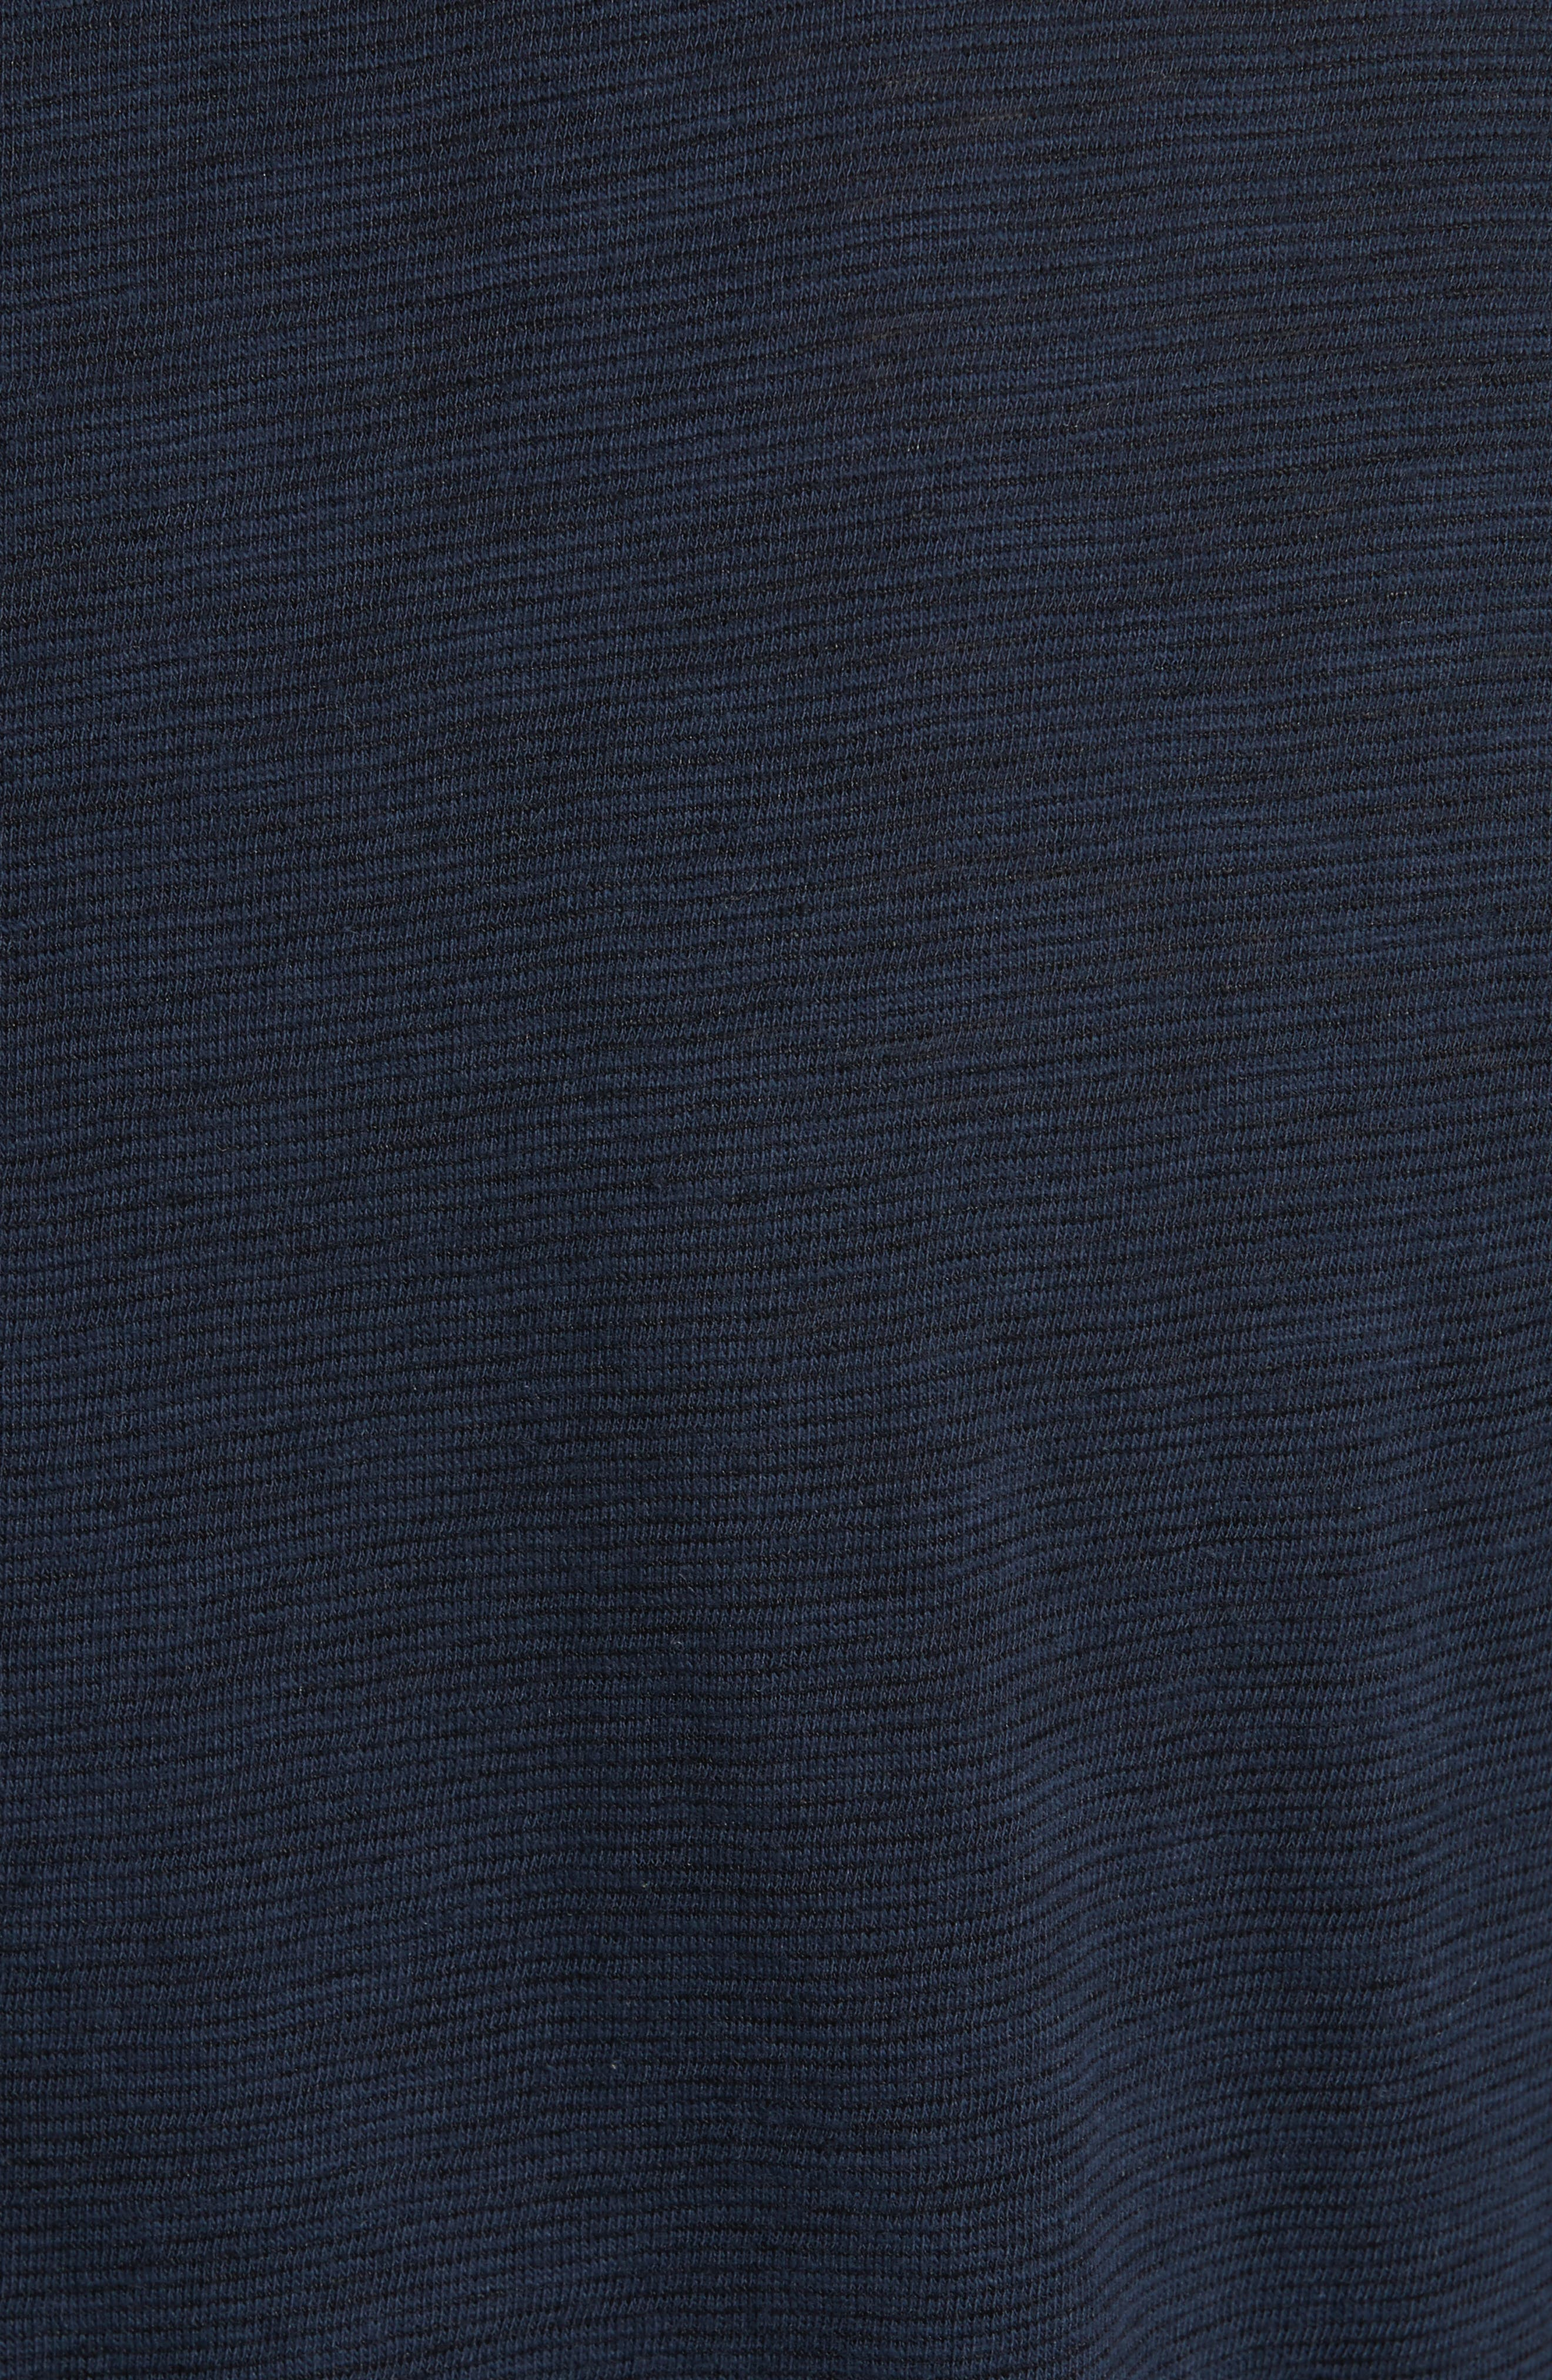 Owen Pocket T-Shirt,                             Alternate thumbnail 5, color,                             410